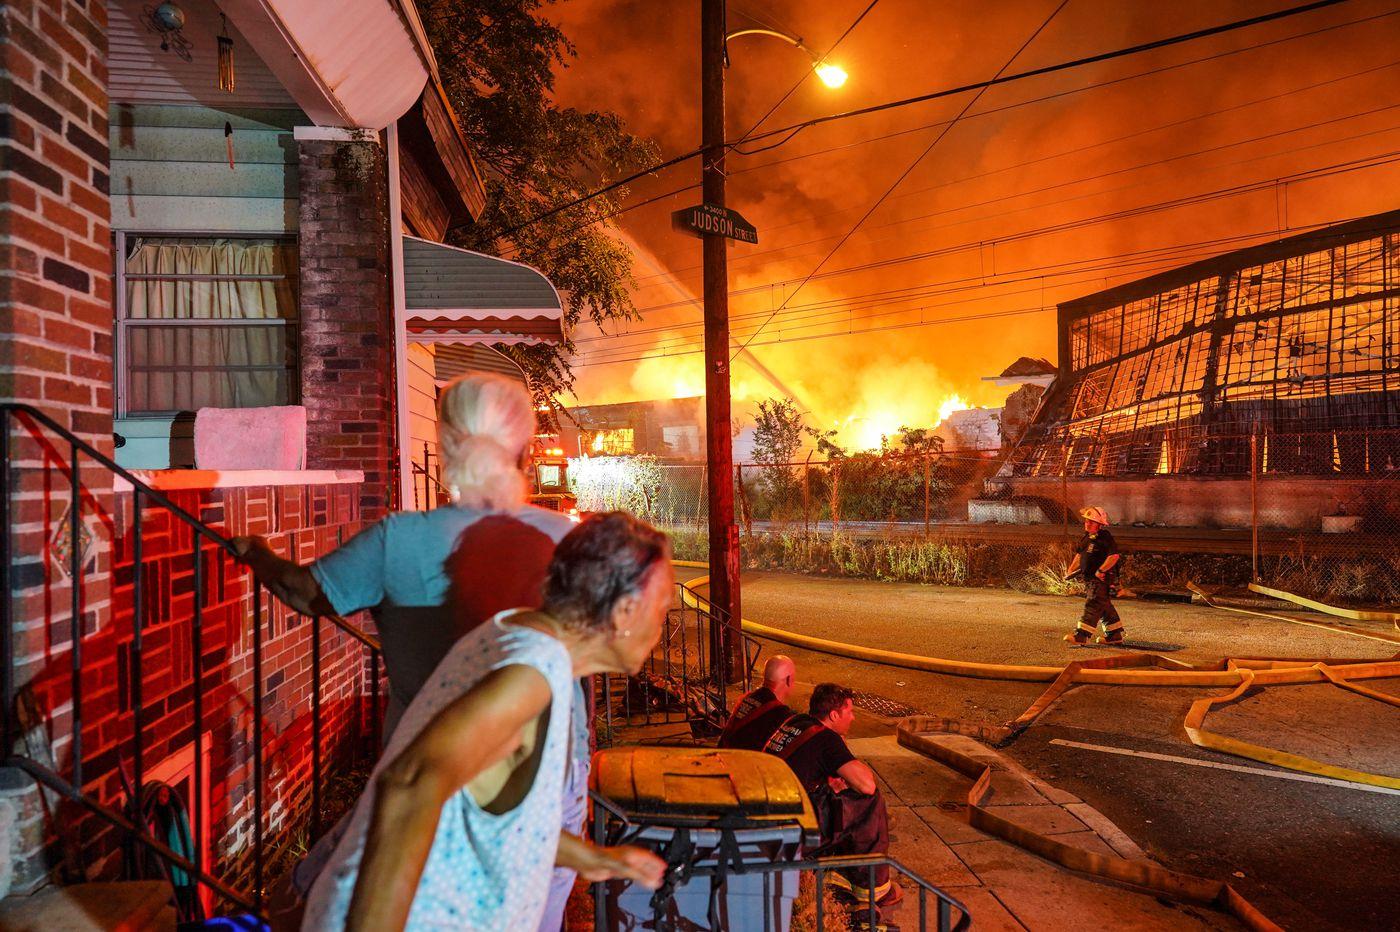 1 firefighter injured battling six-alarm warehouse fire in North Philadelphia